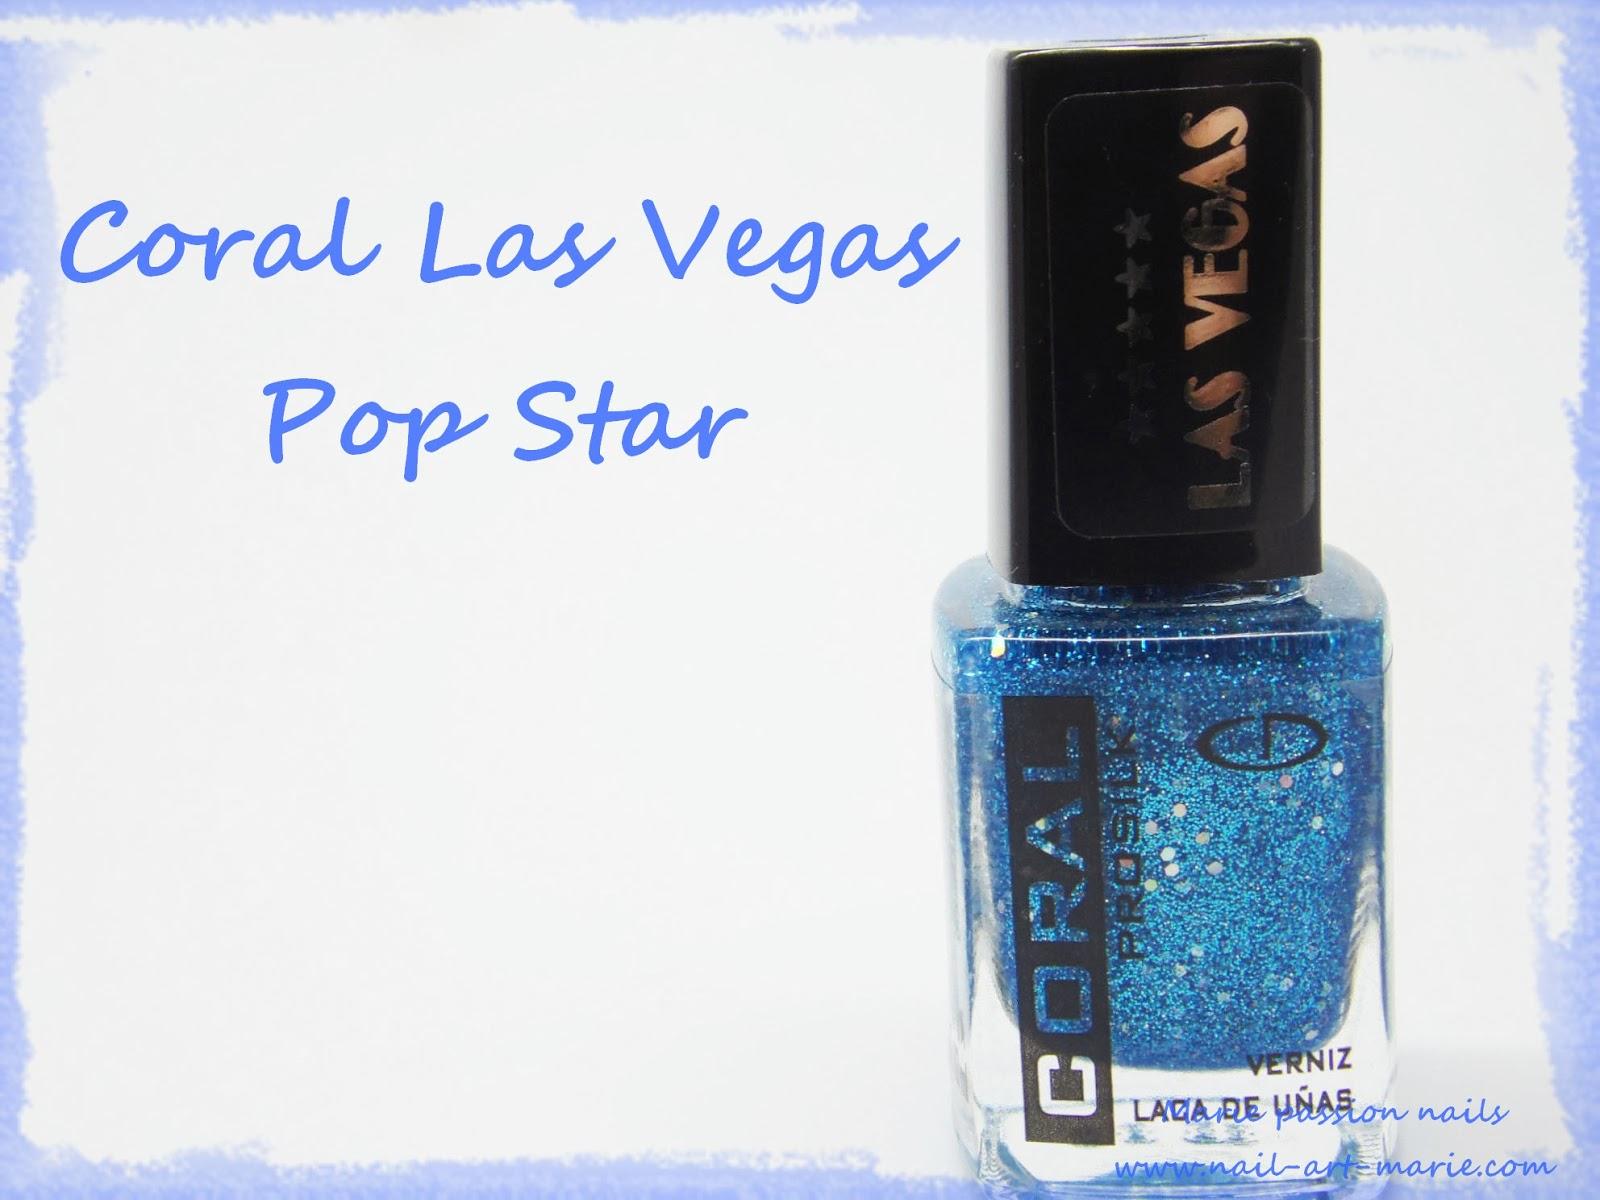 Coral Las Vegas Pop Star1